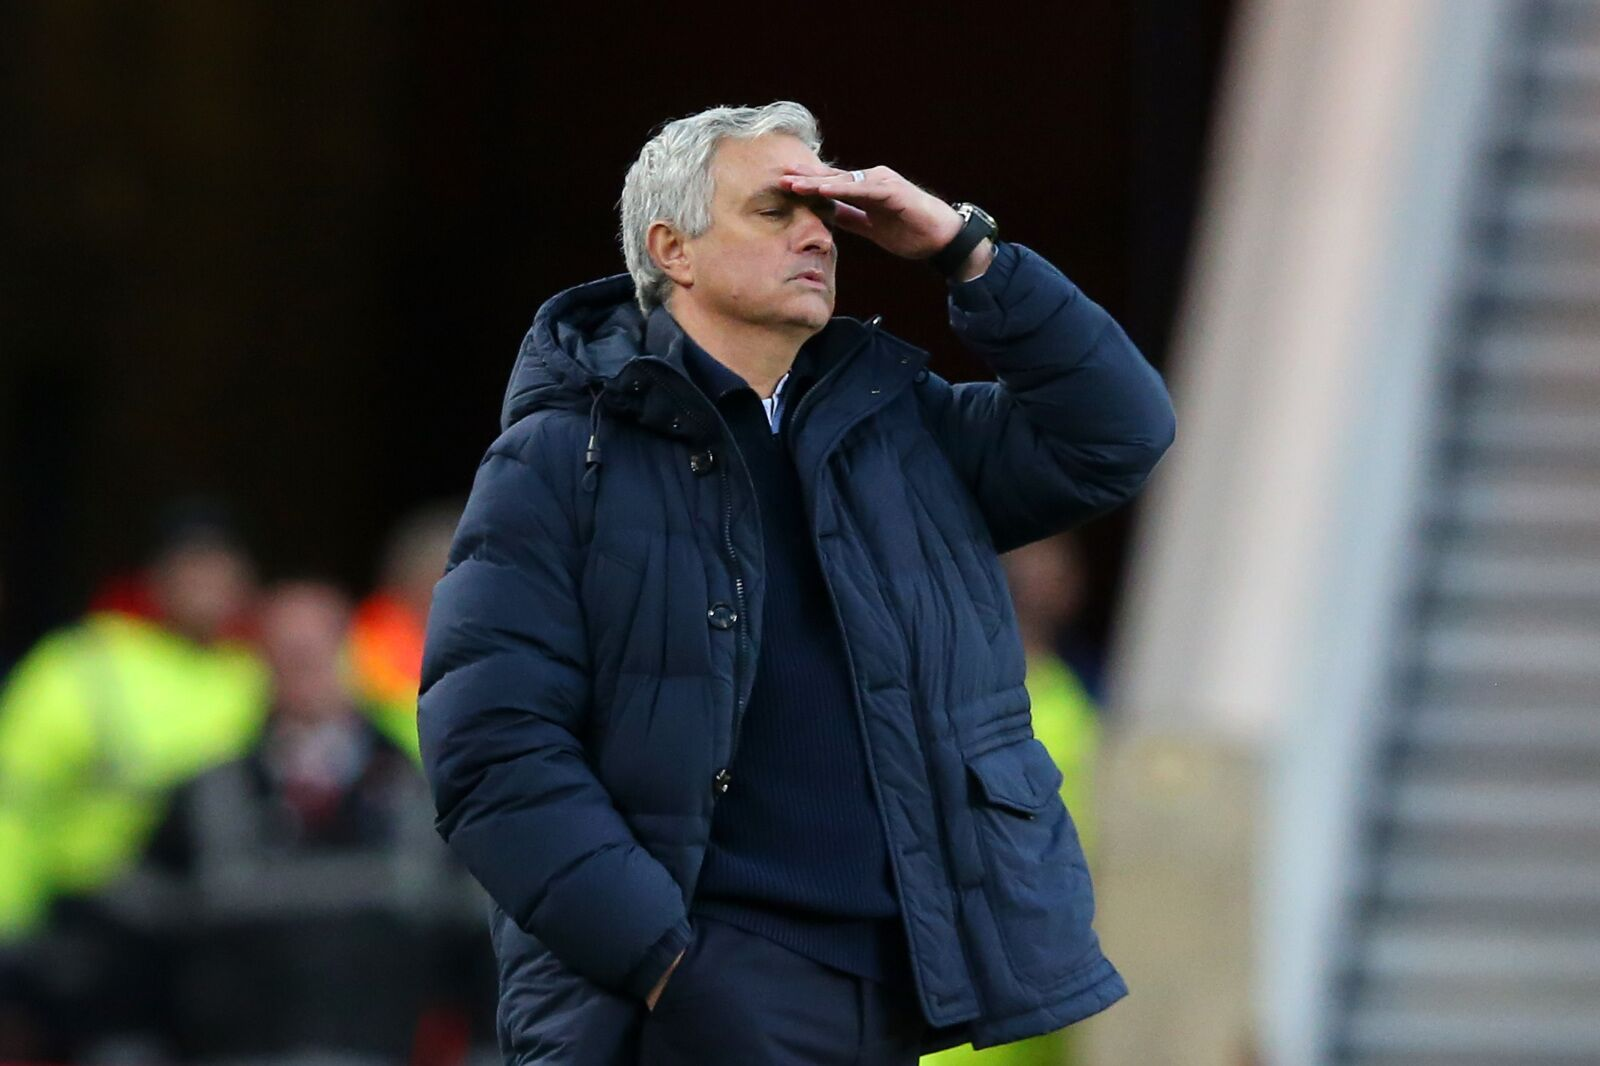 Another curious decision by Tottenham's Jose Mourinho